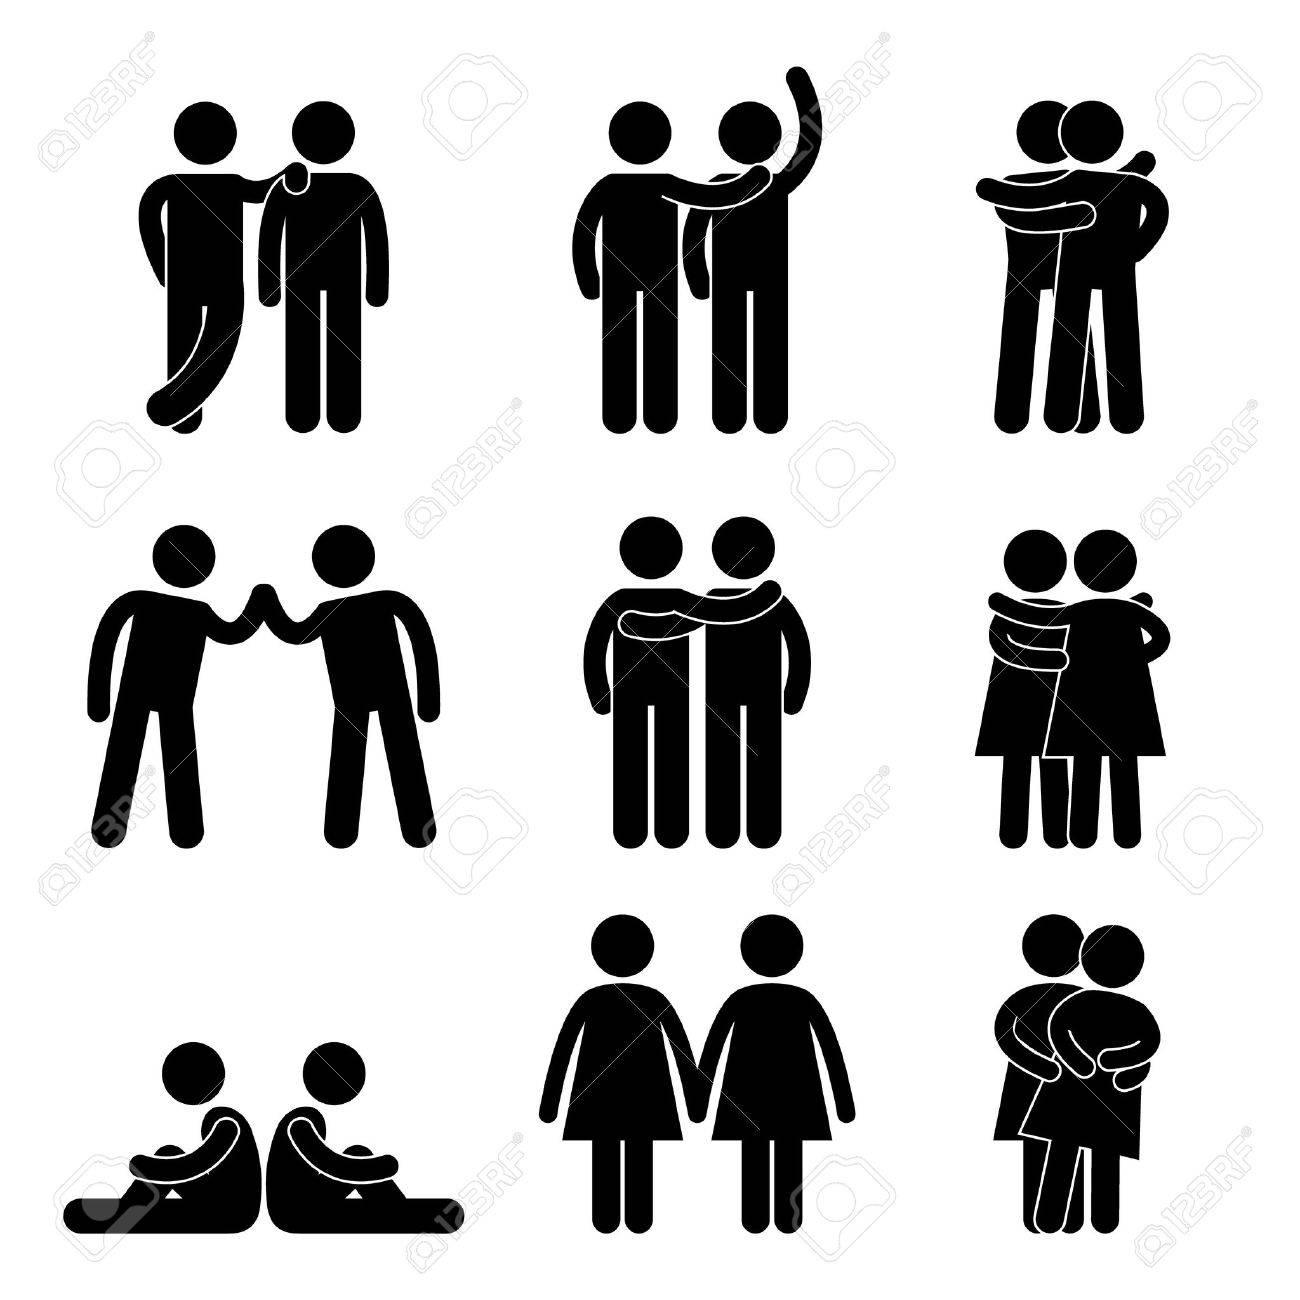 Relationship Icon Symbol Sign Pictogram Standard-Bild - 11965721